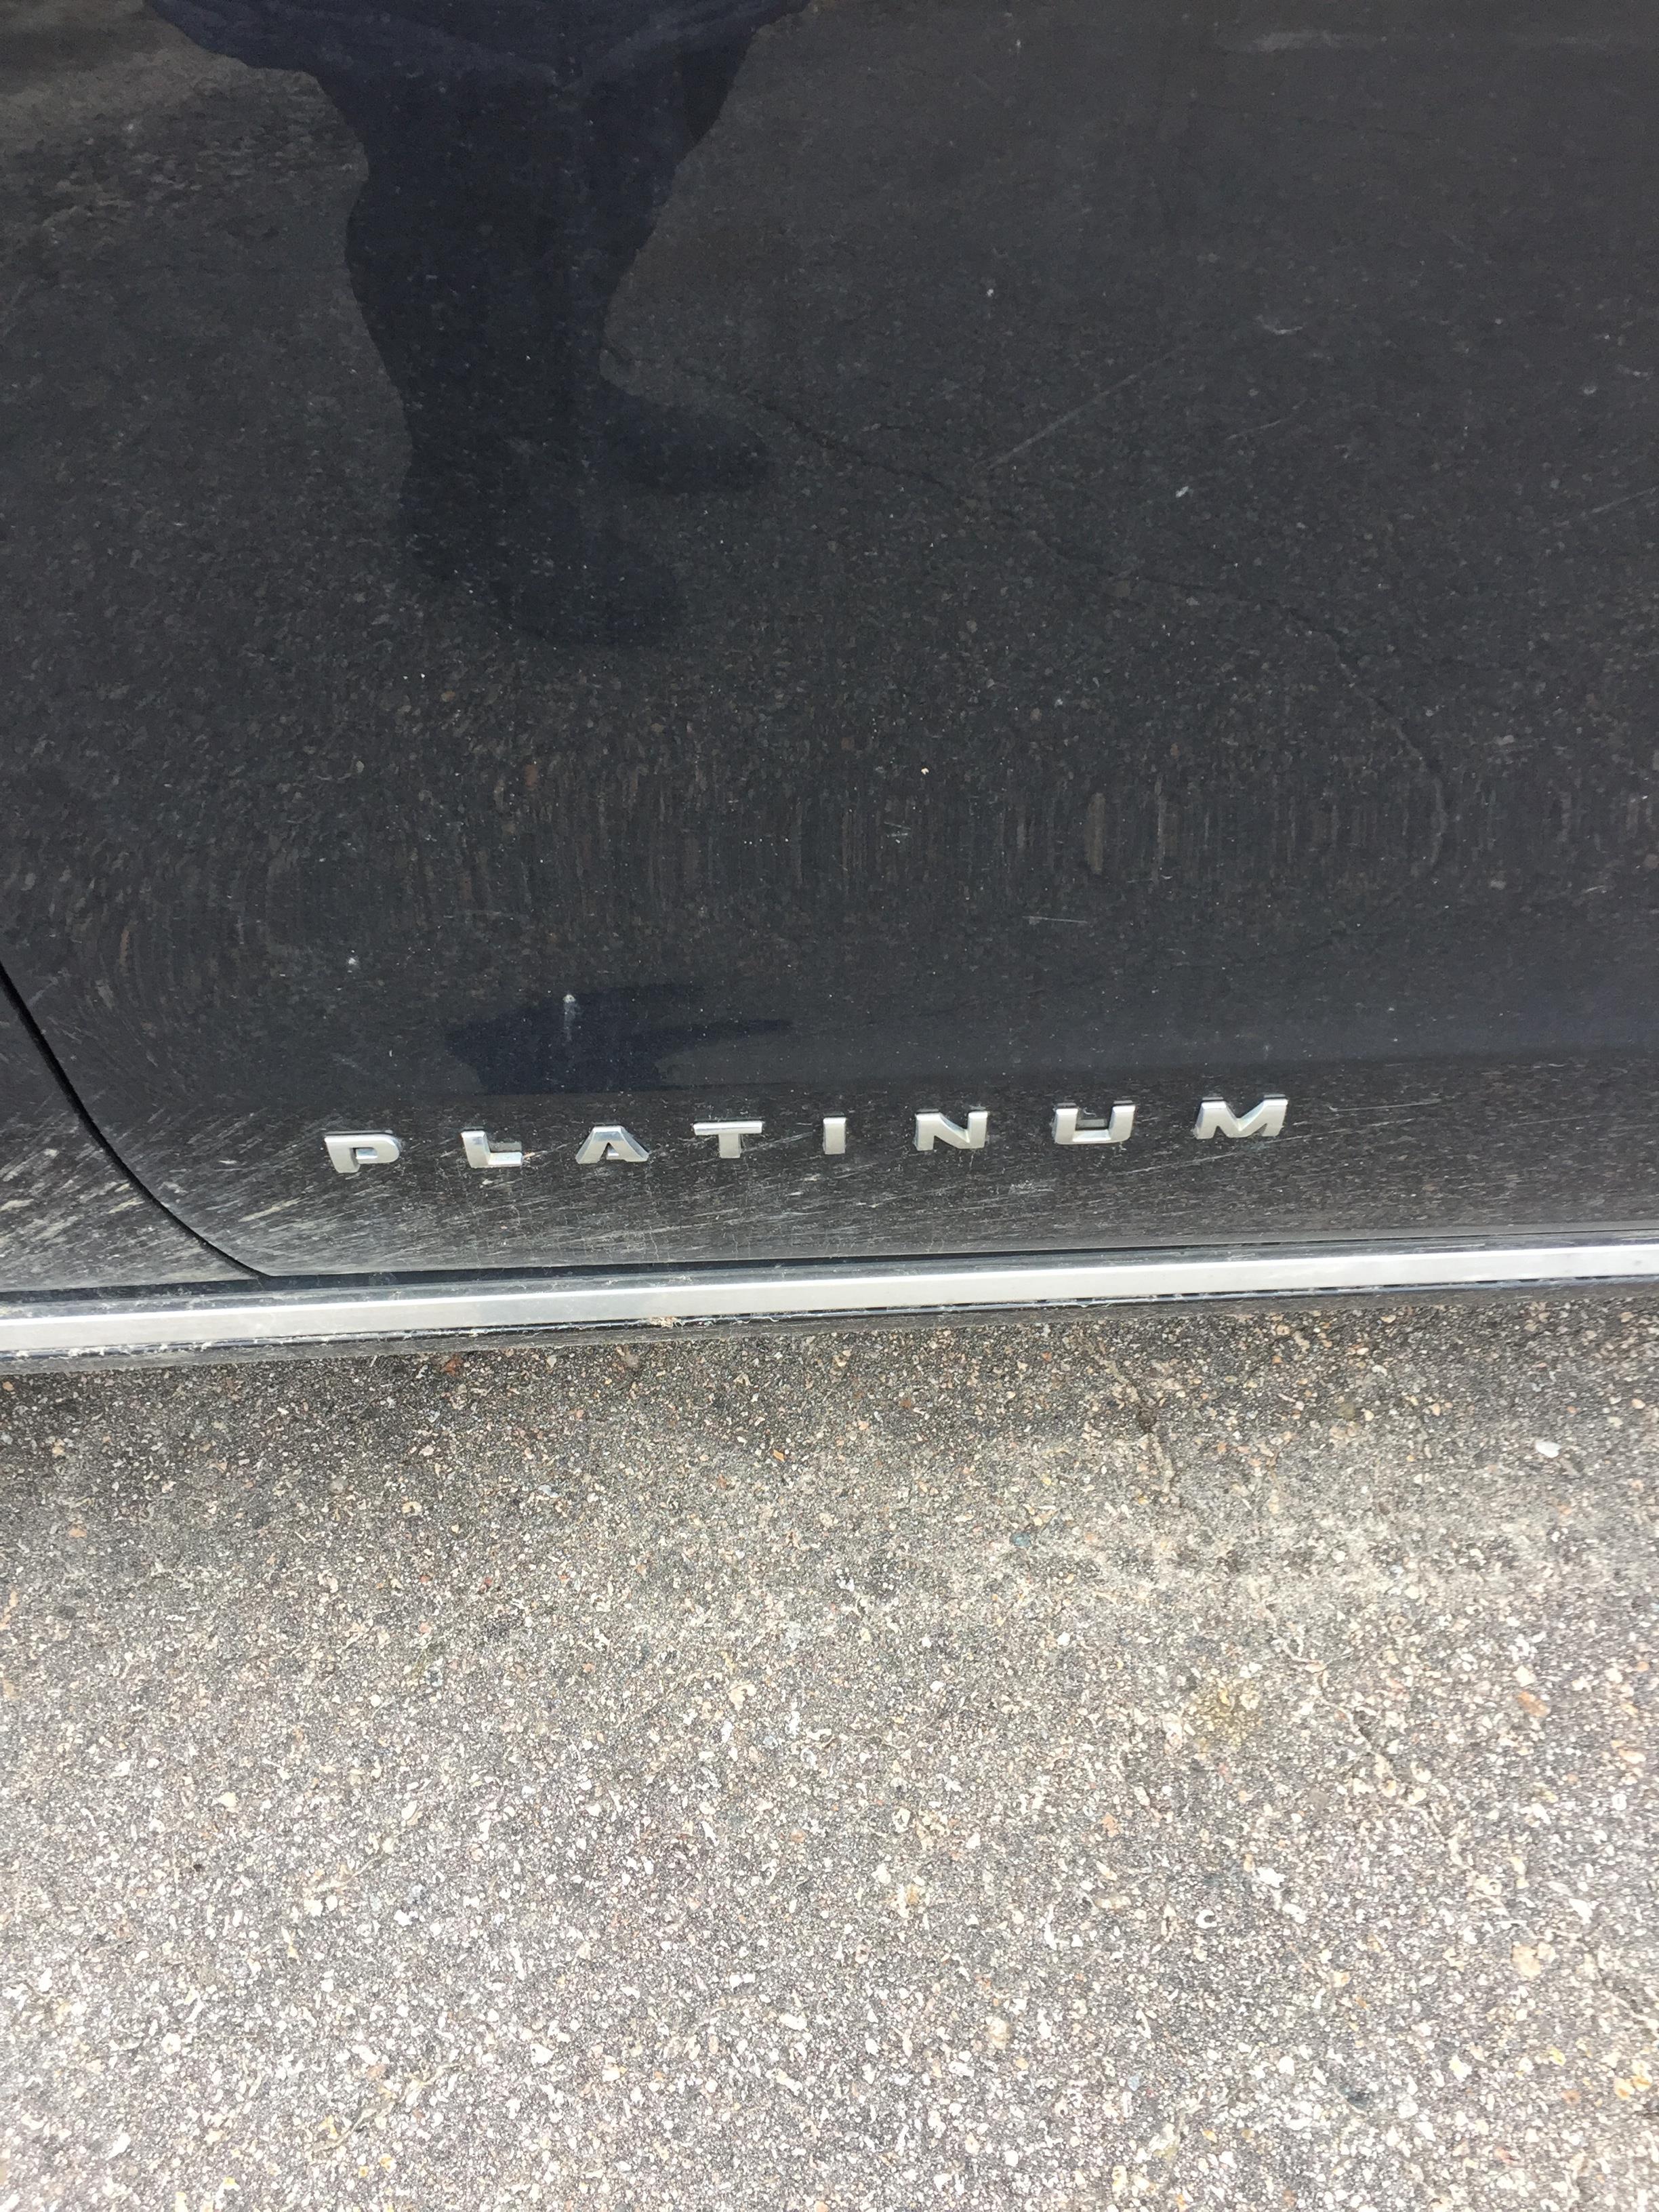 2018 Ford Expedition Platinum Max